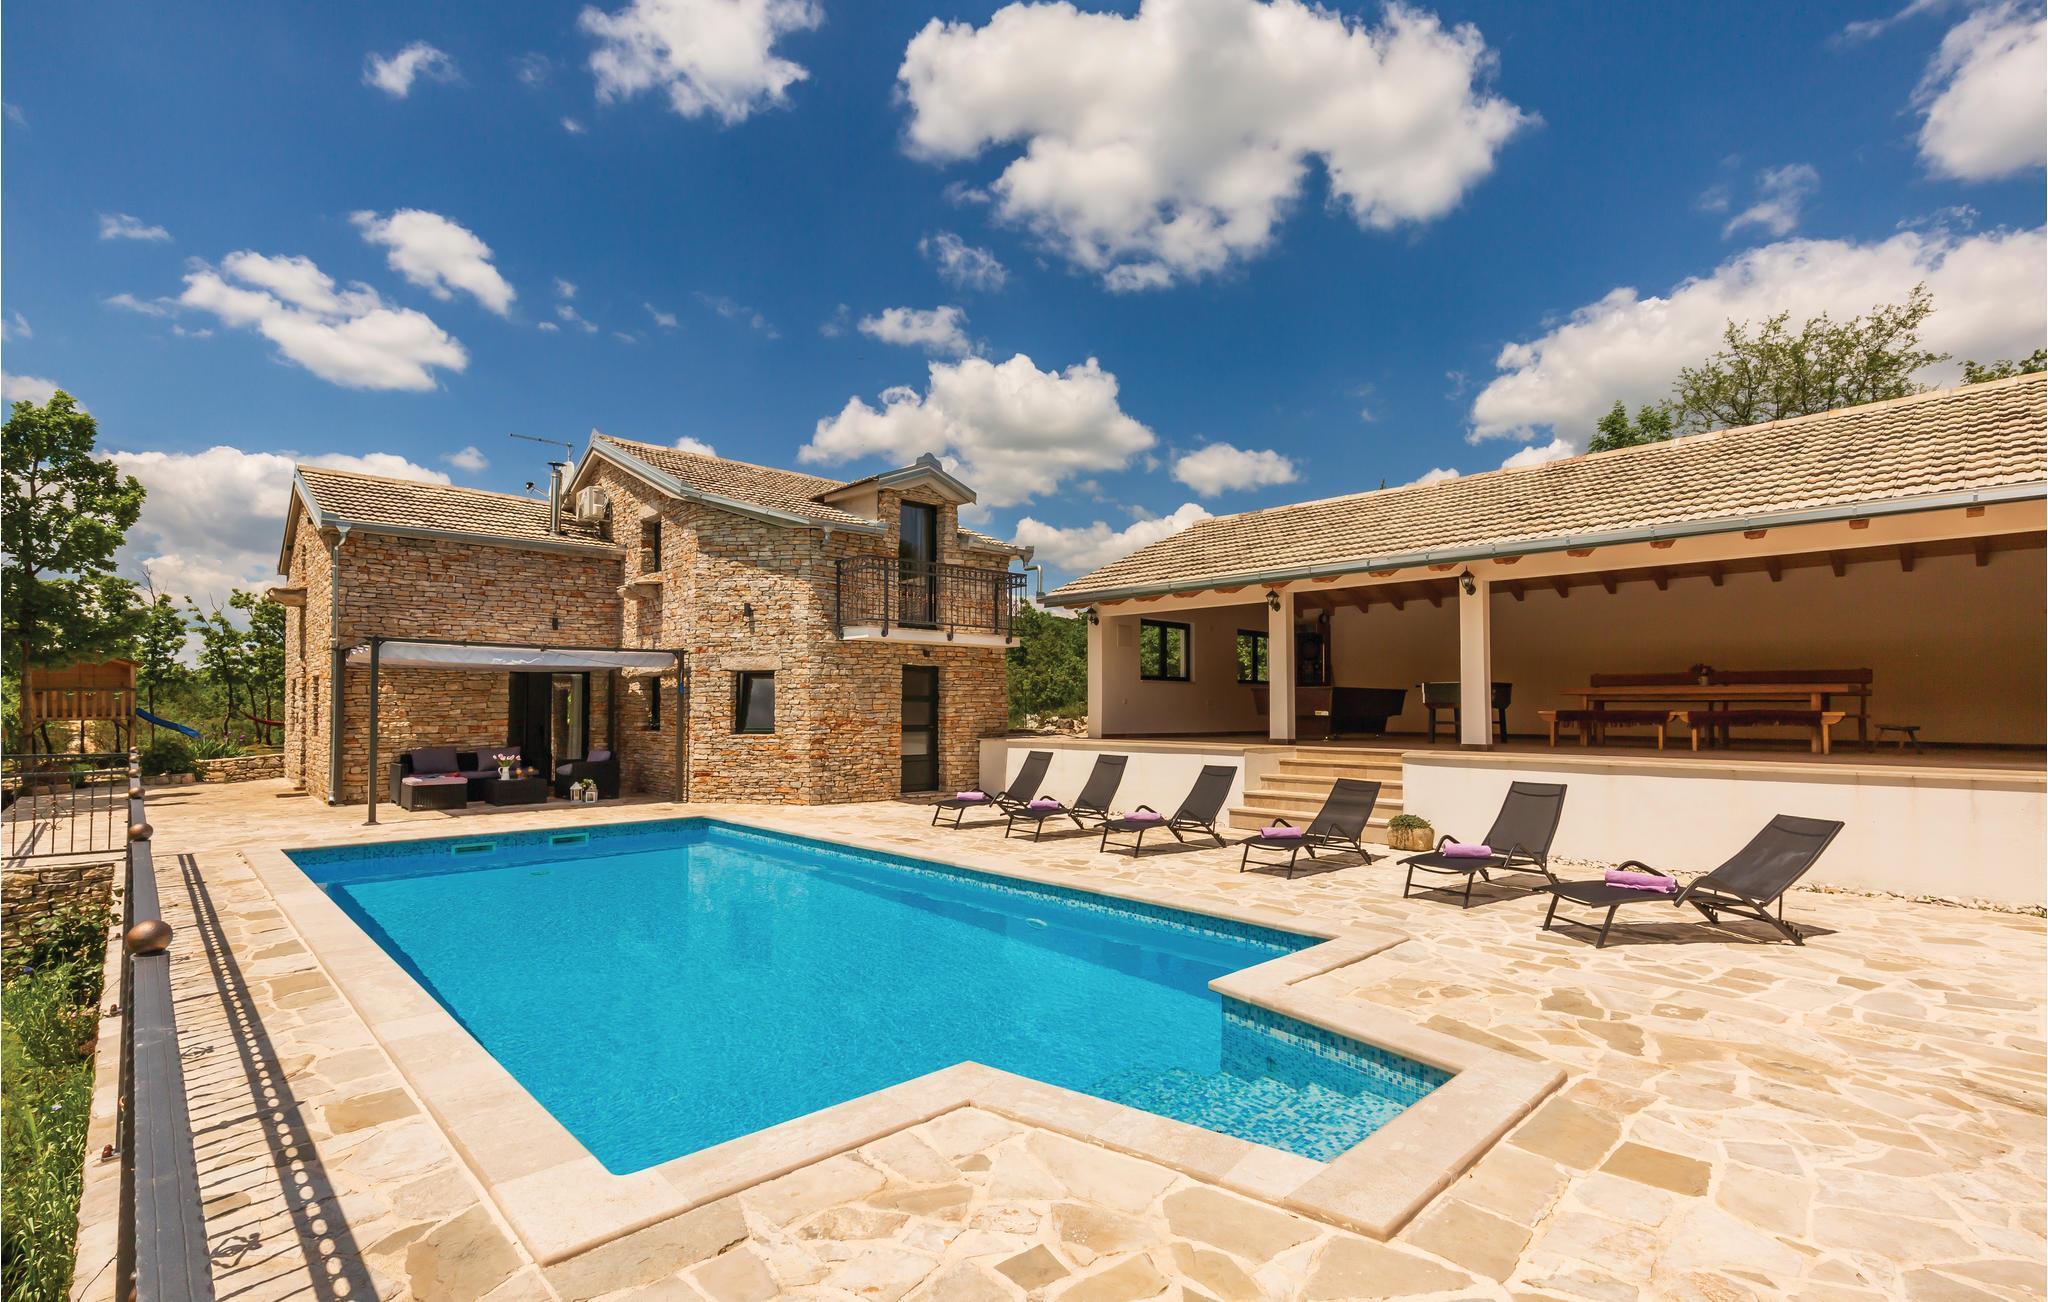 Gartengestaltung Mit Pool Luxus Holiday Home Apartment 10 Persons Kicerak Makarska Krivodol Krivodol